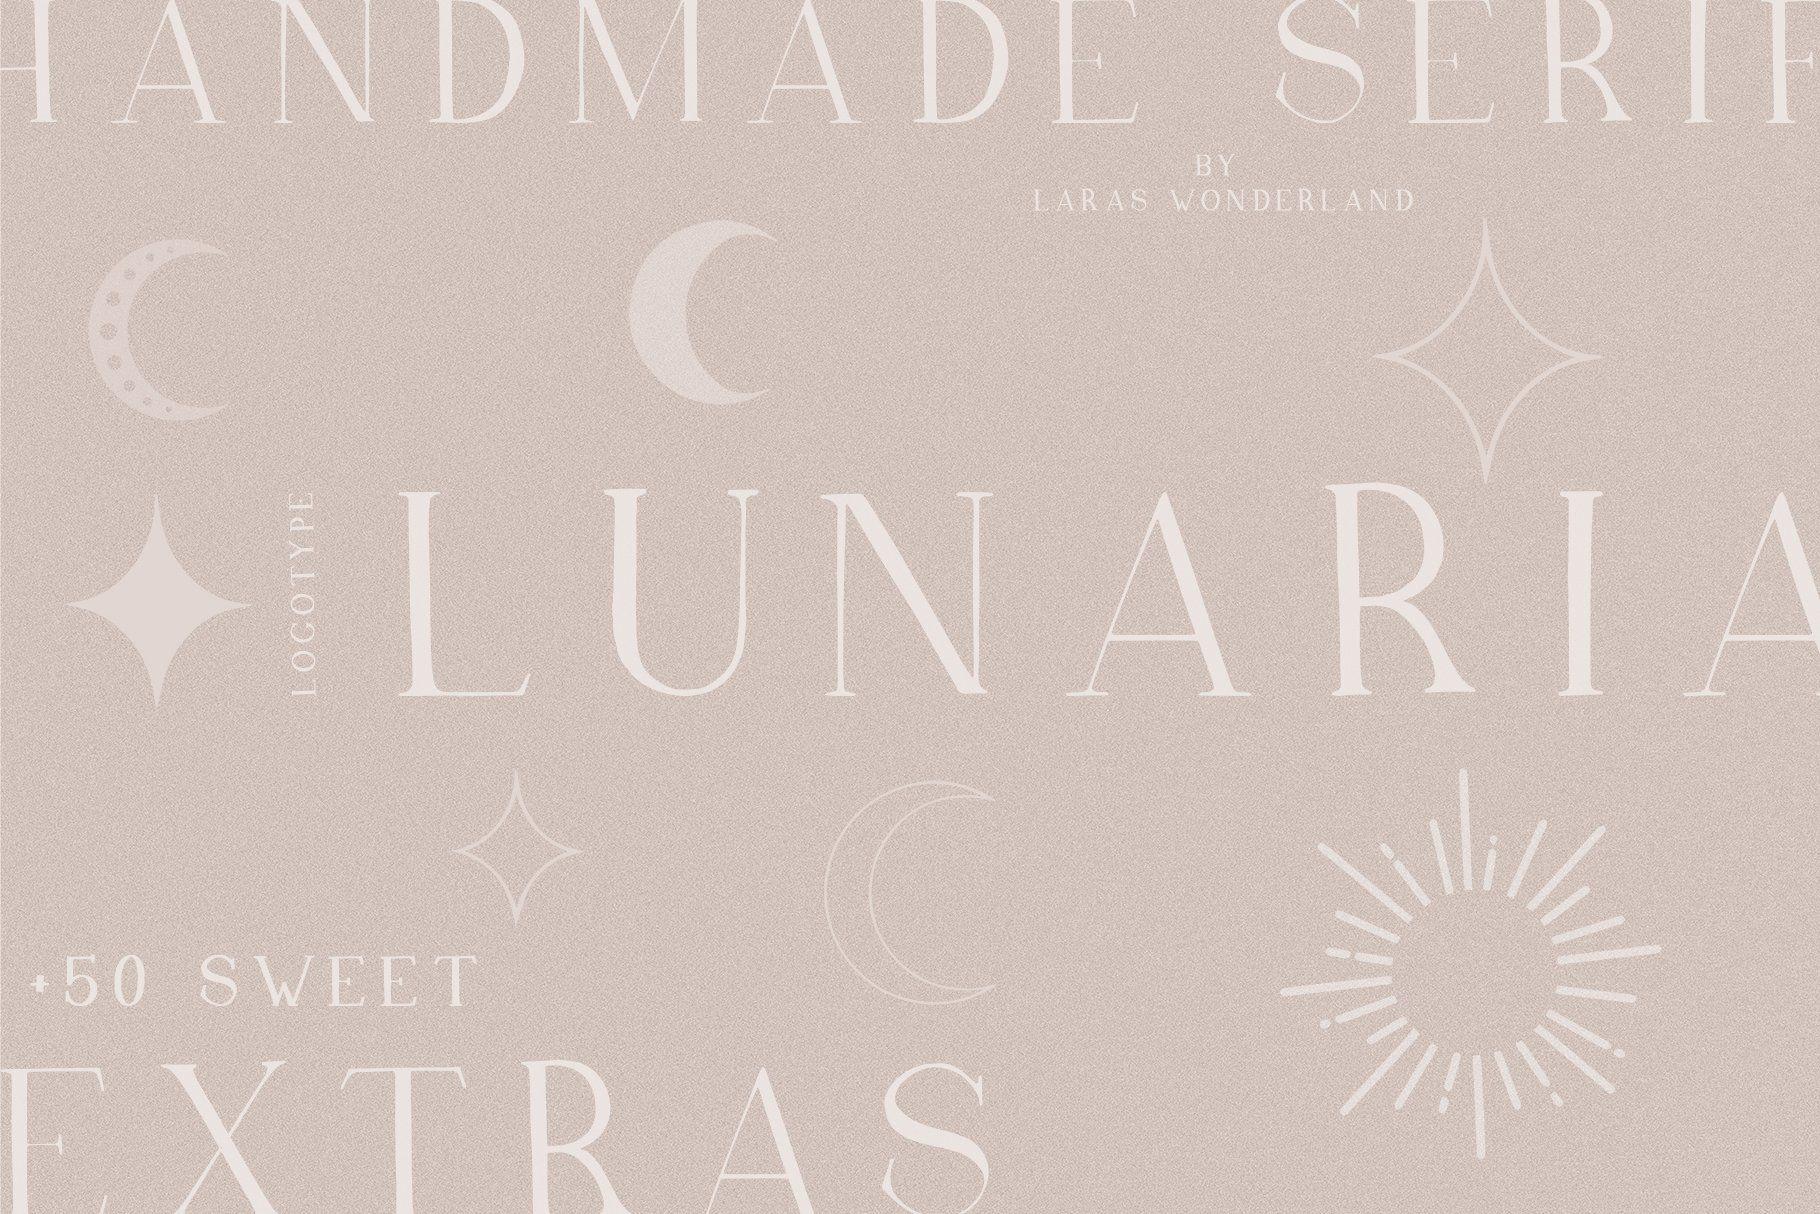 Lunaria Handmade Serif Font in 2020 Handmade logo